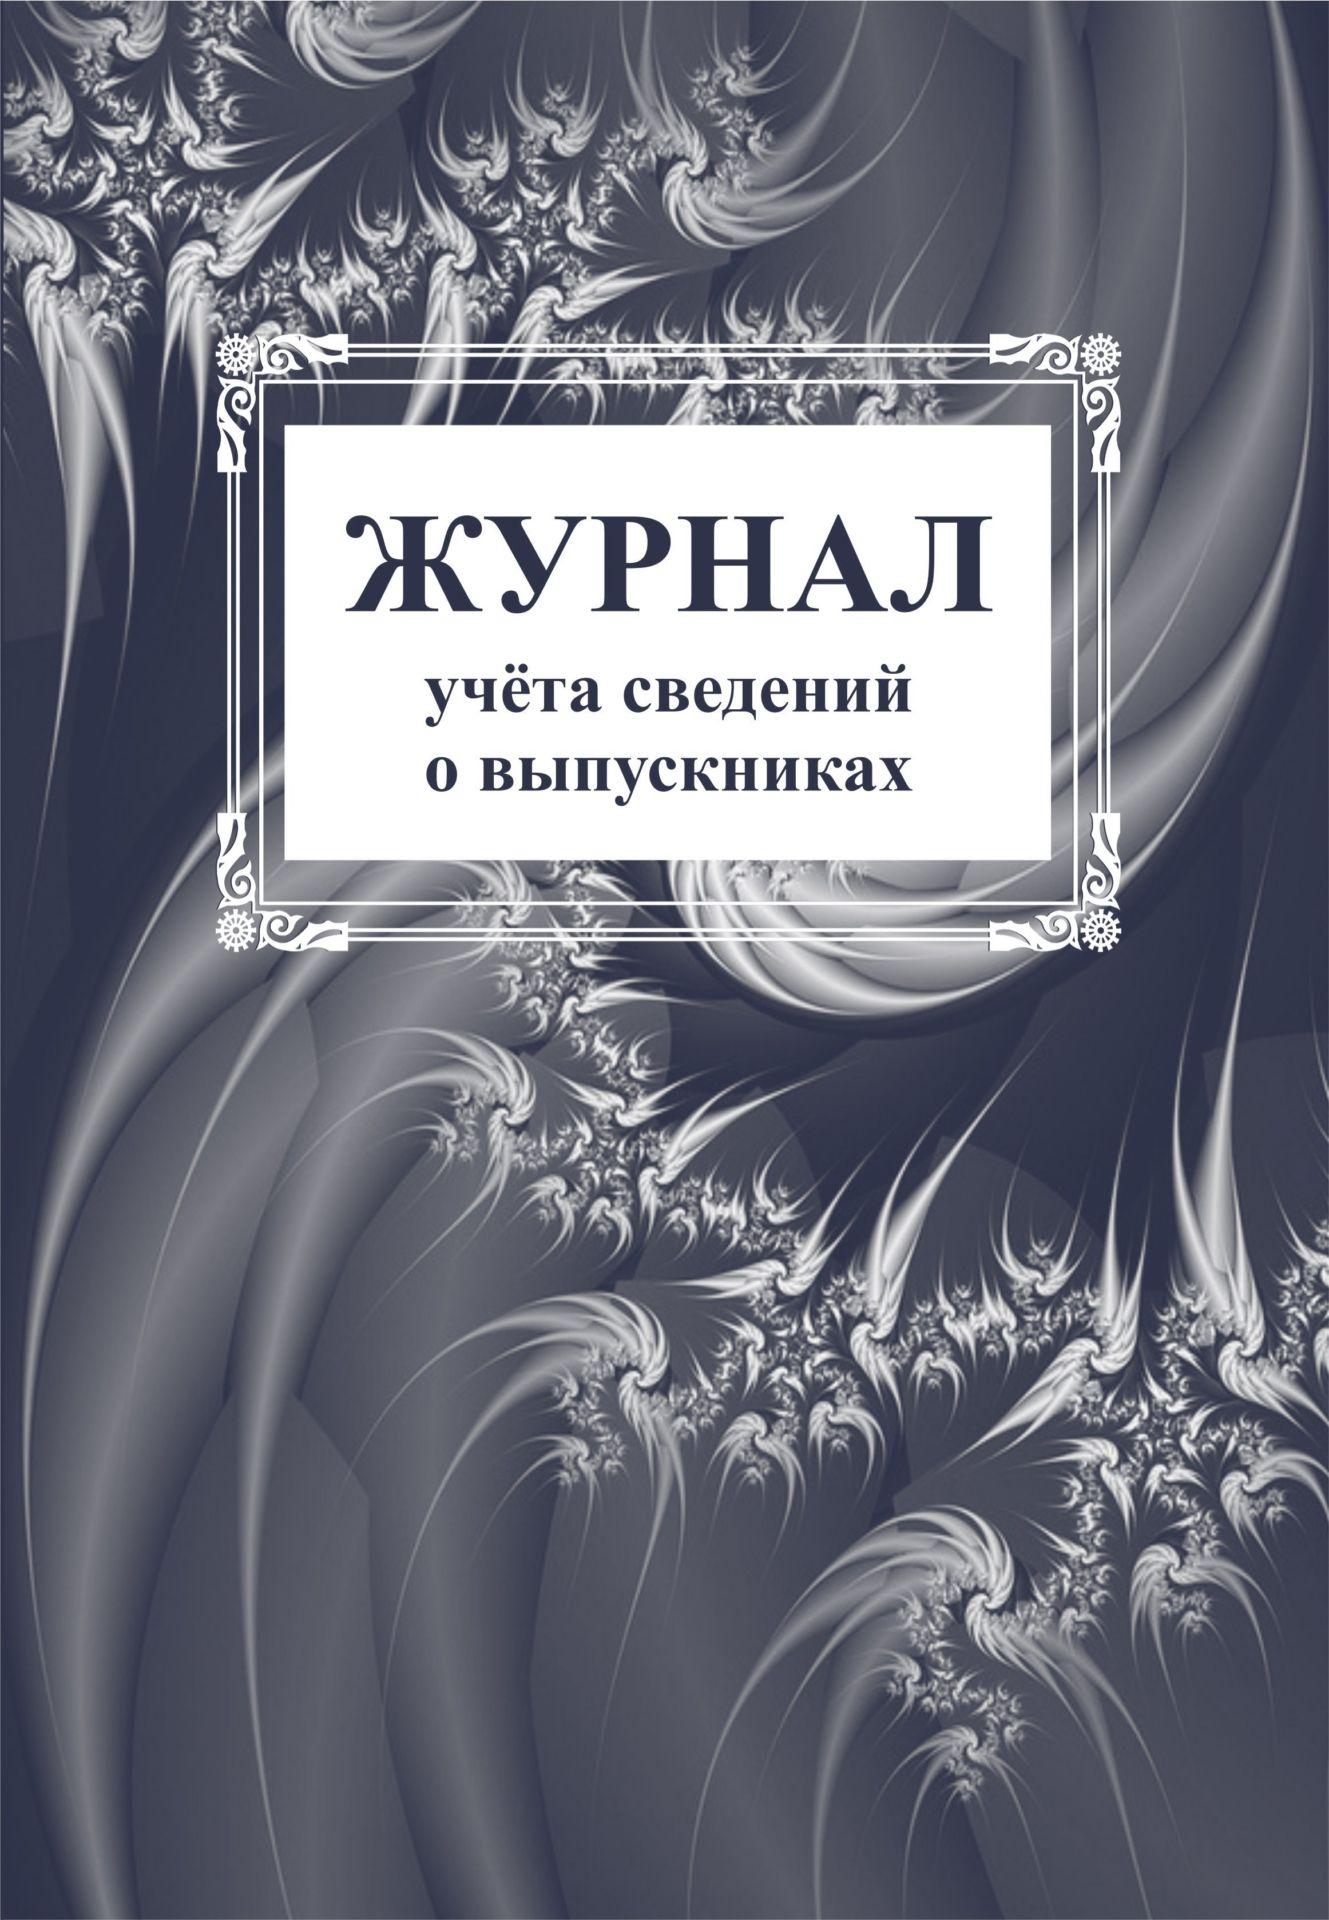 Журнал учета сведений о выпускниках ТД